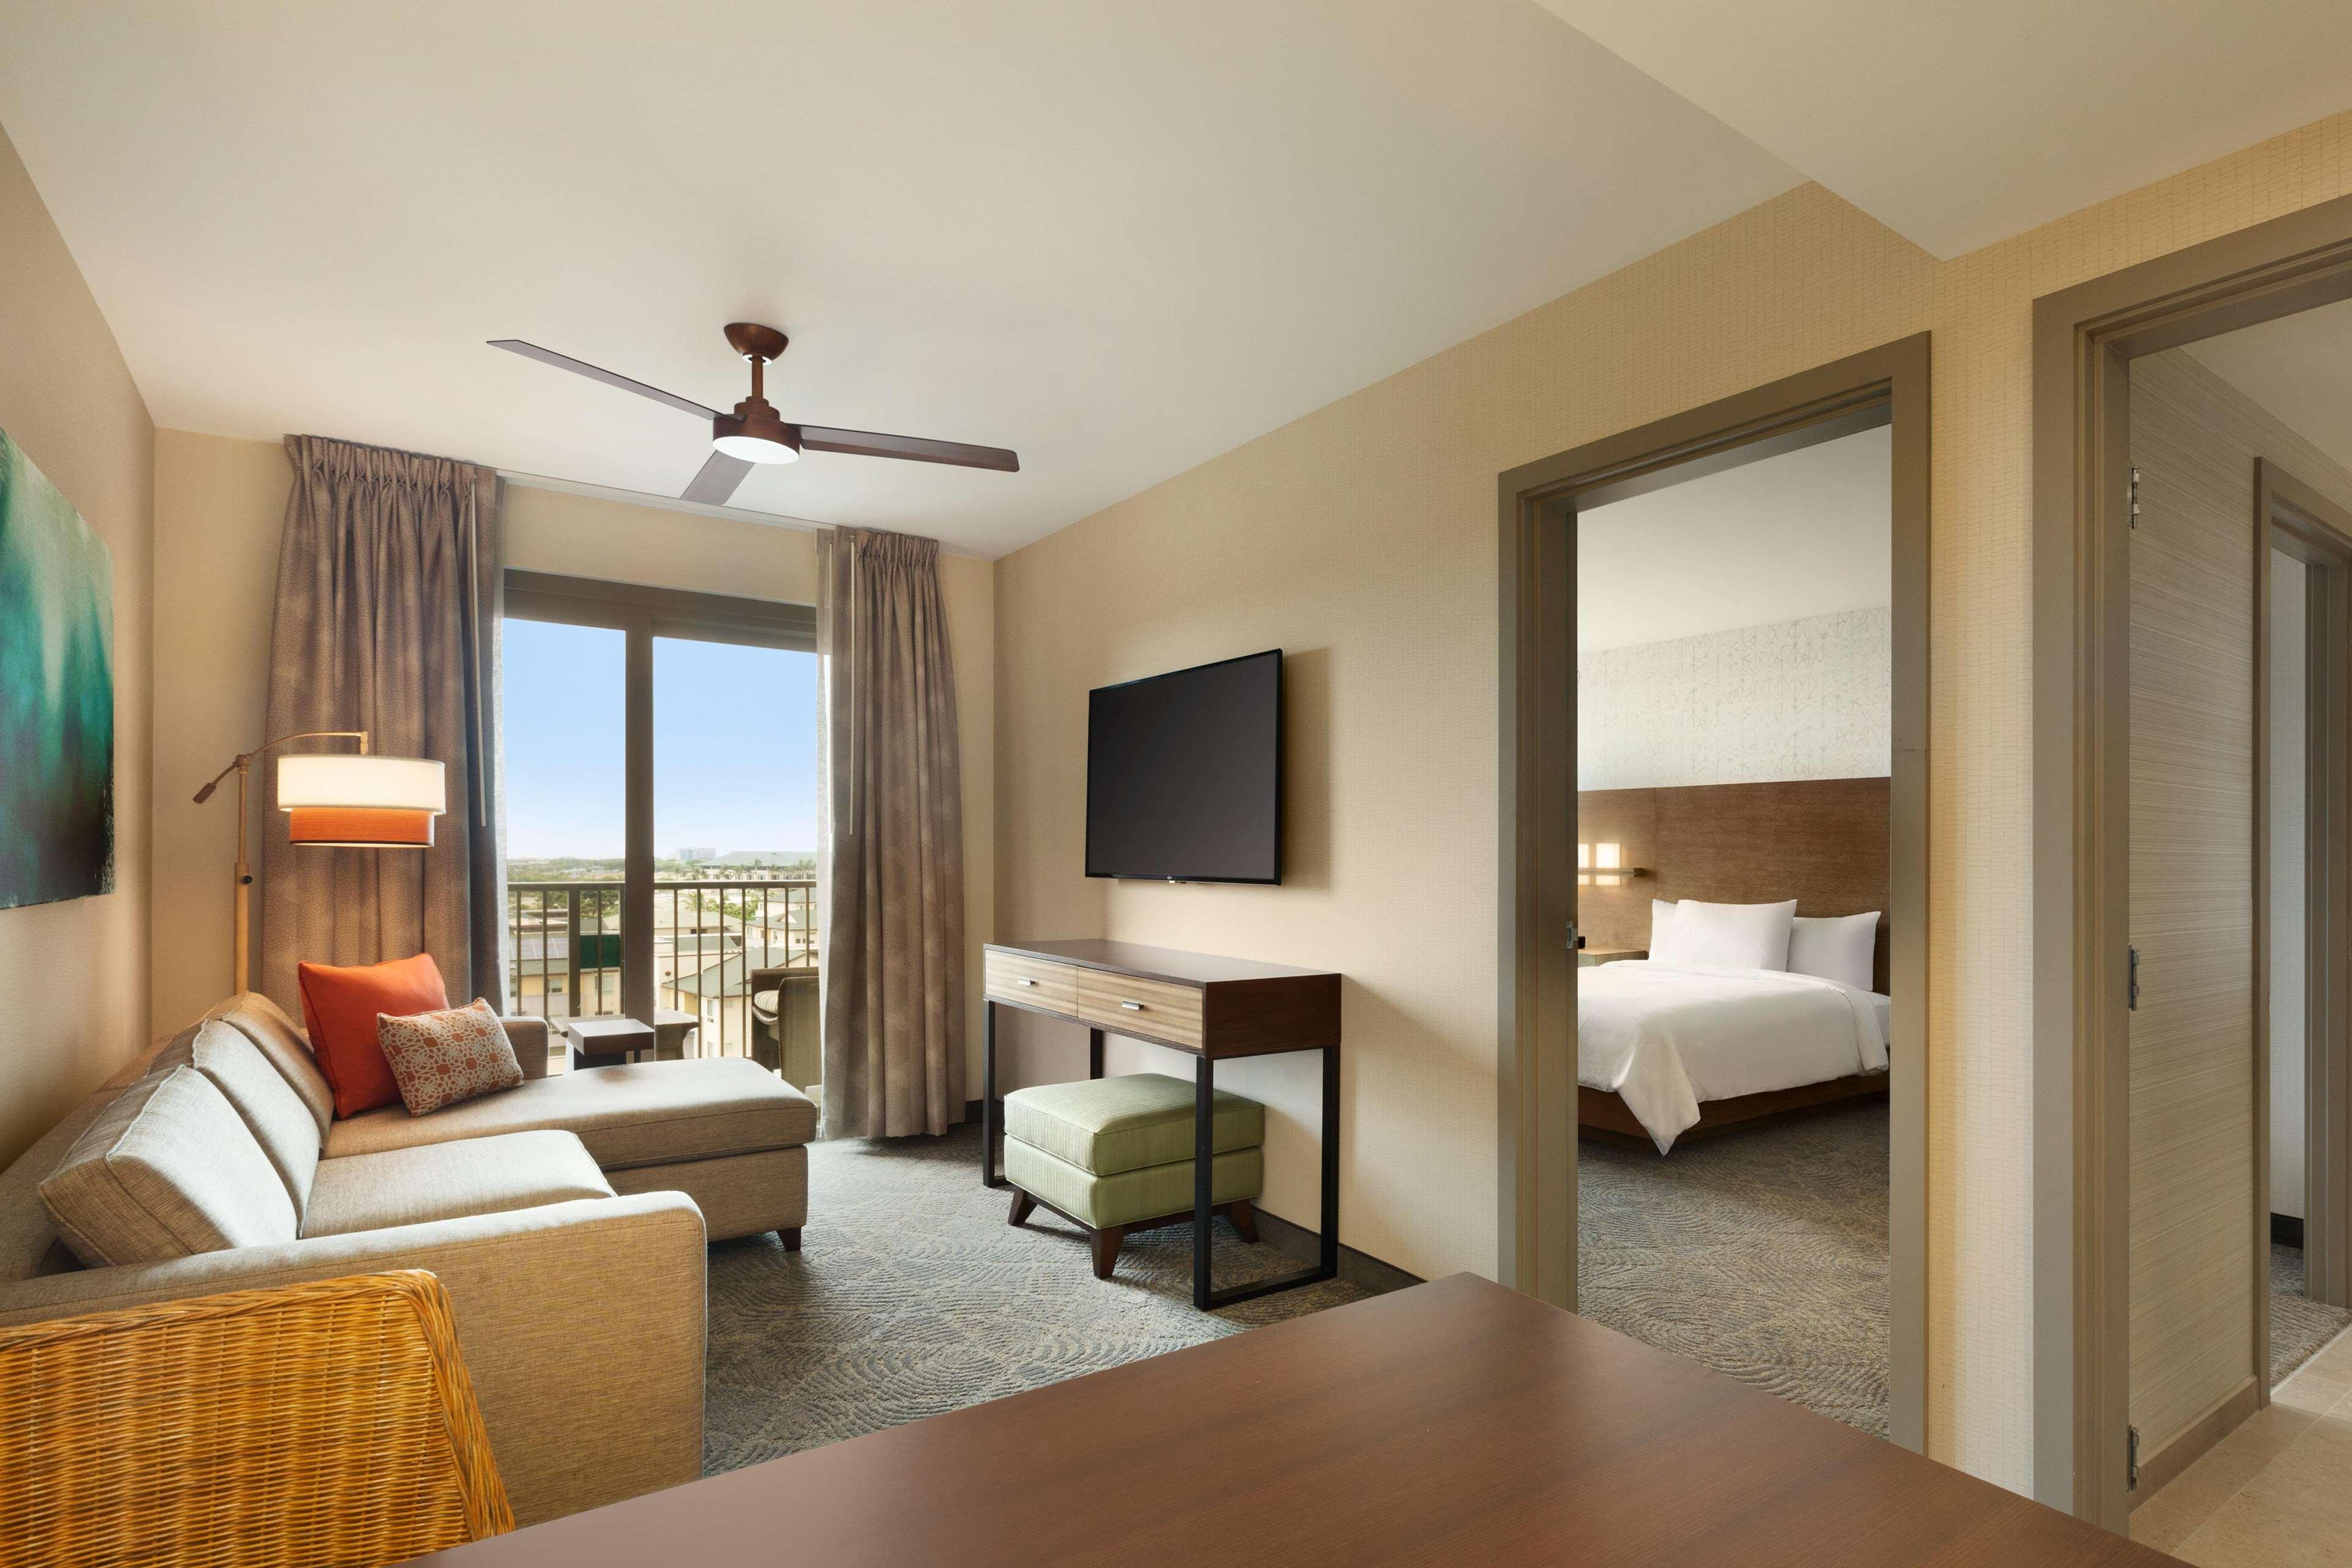 Embassy Suites by Hilton Oahu Kapolei image 35